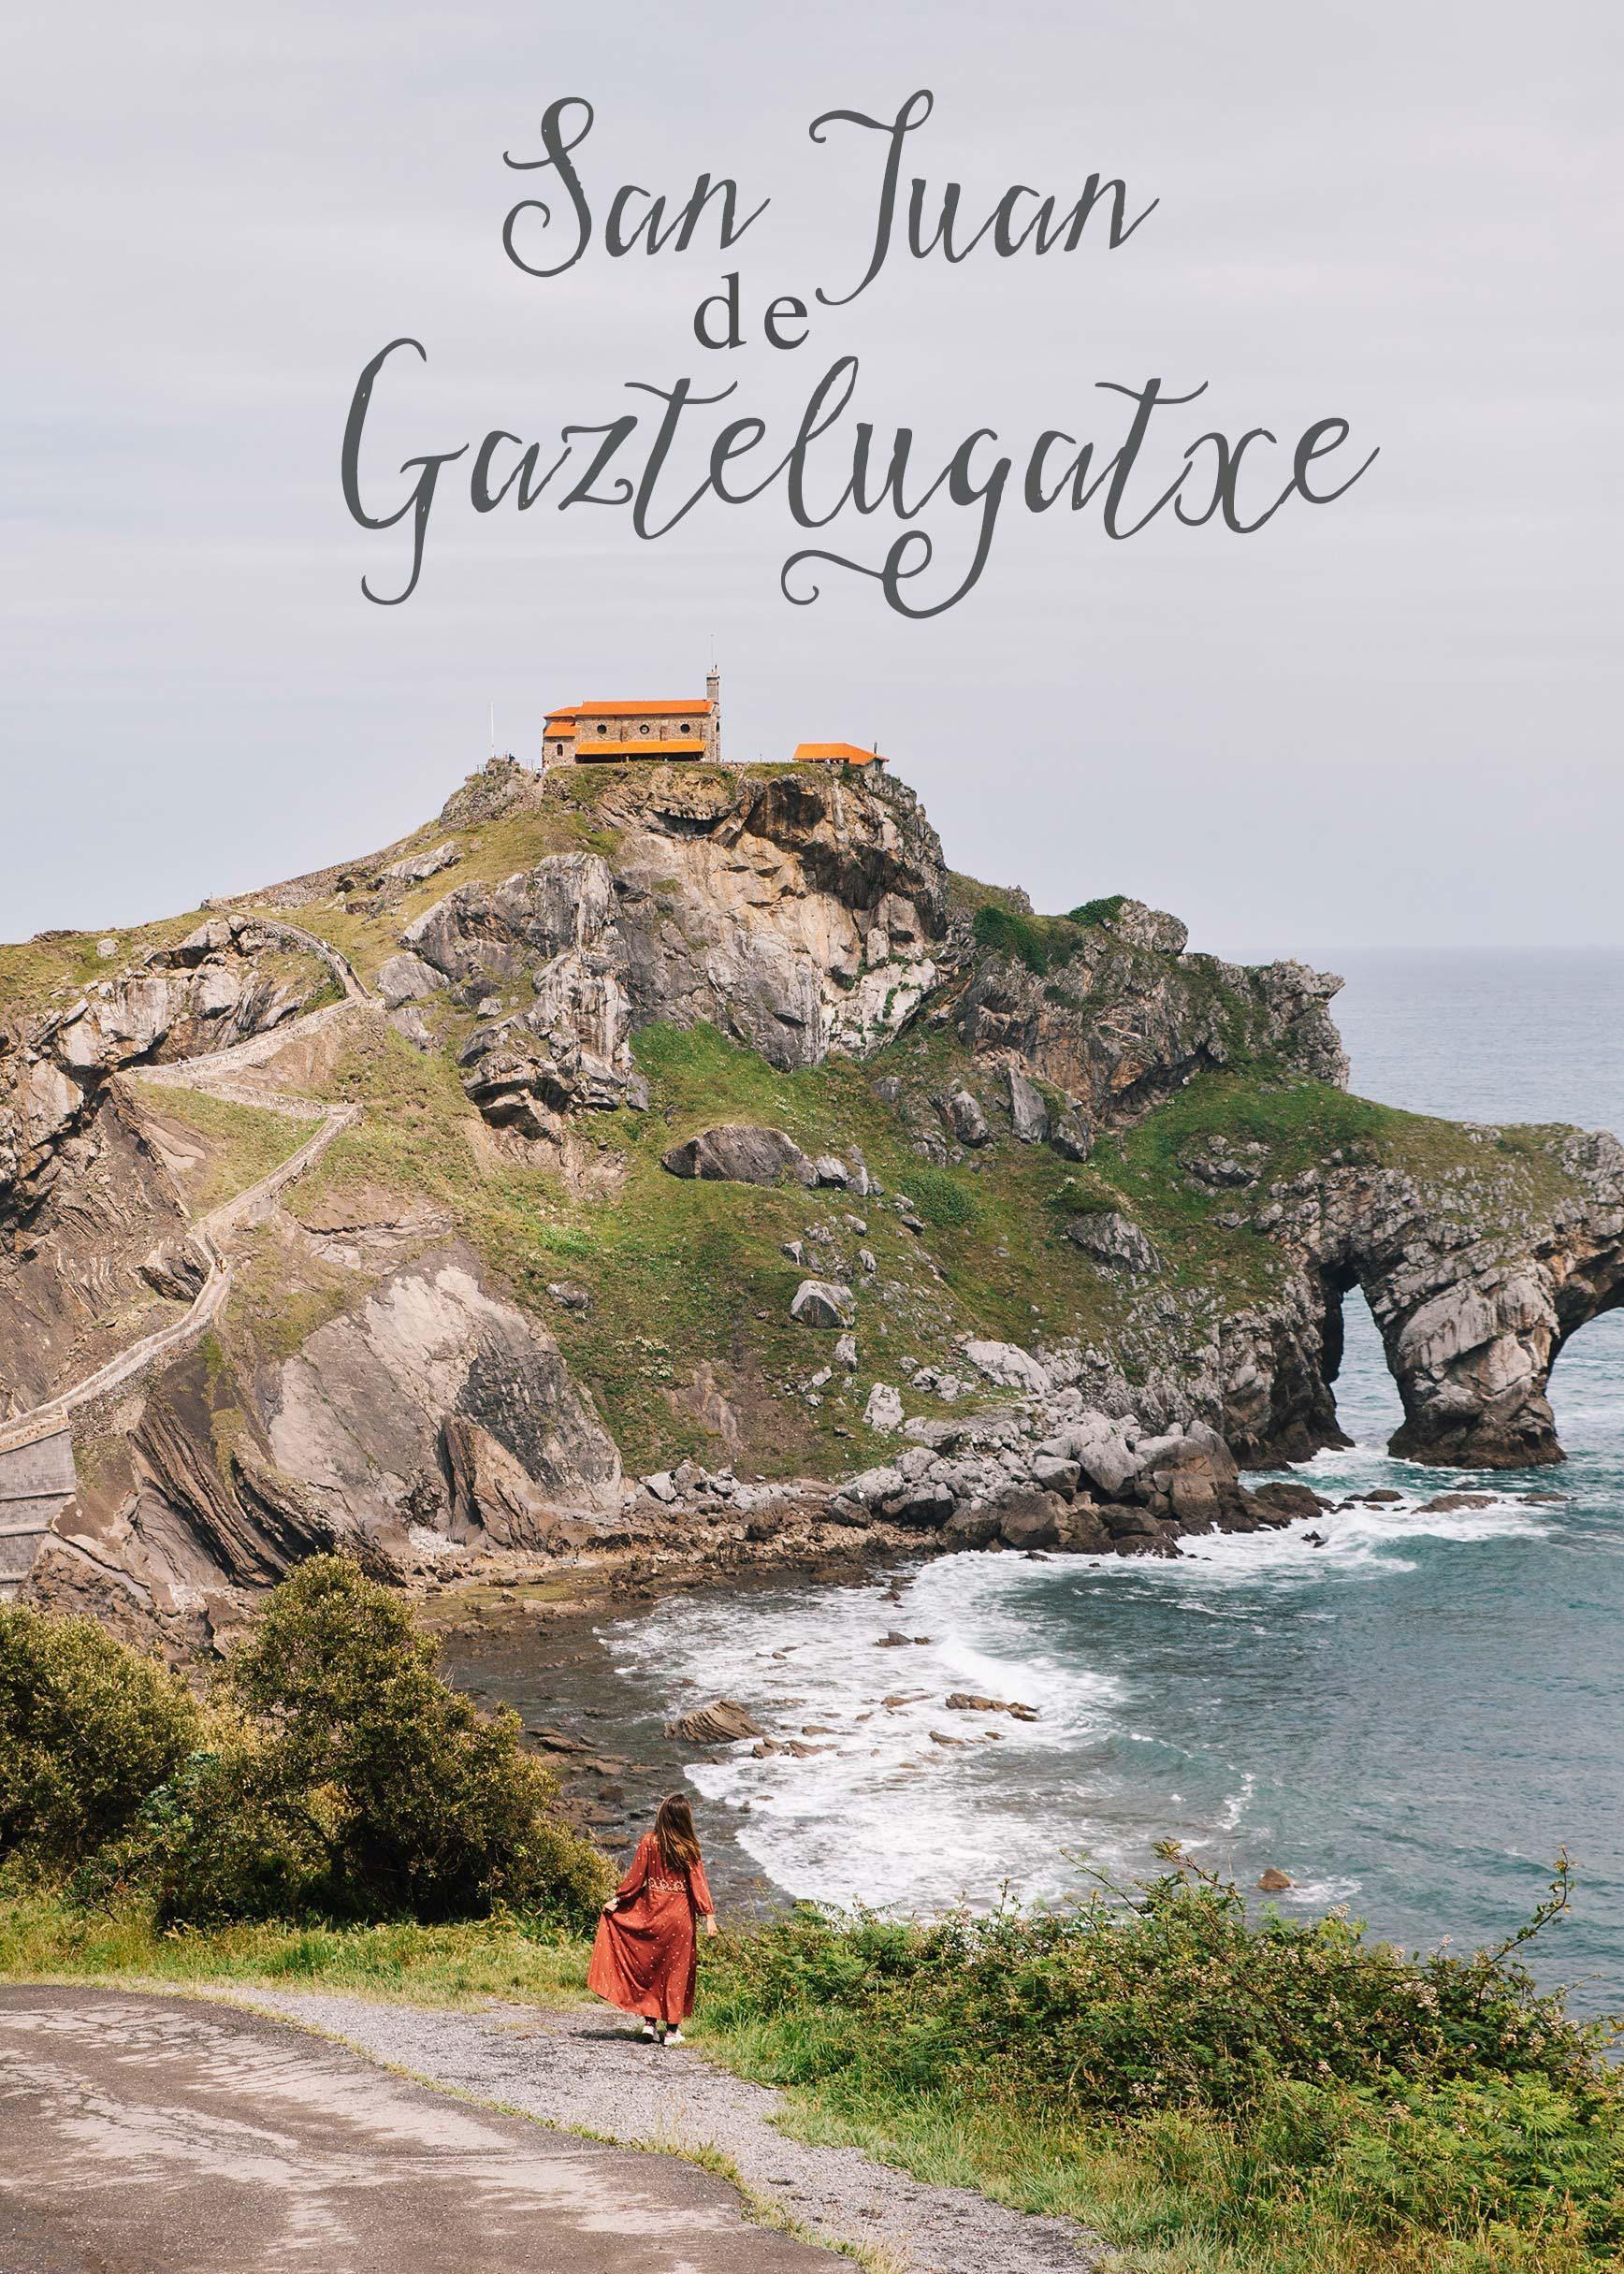 San Juan De Gaztelugatxe Es Un Lugar Mágico Del Pais Vasco Un Entorno Natural Maravilloso Junto Con Historias De Brujas Y Pirata Gaztelugatxe Viajes País Vasco